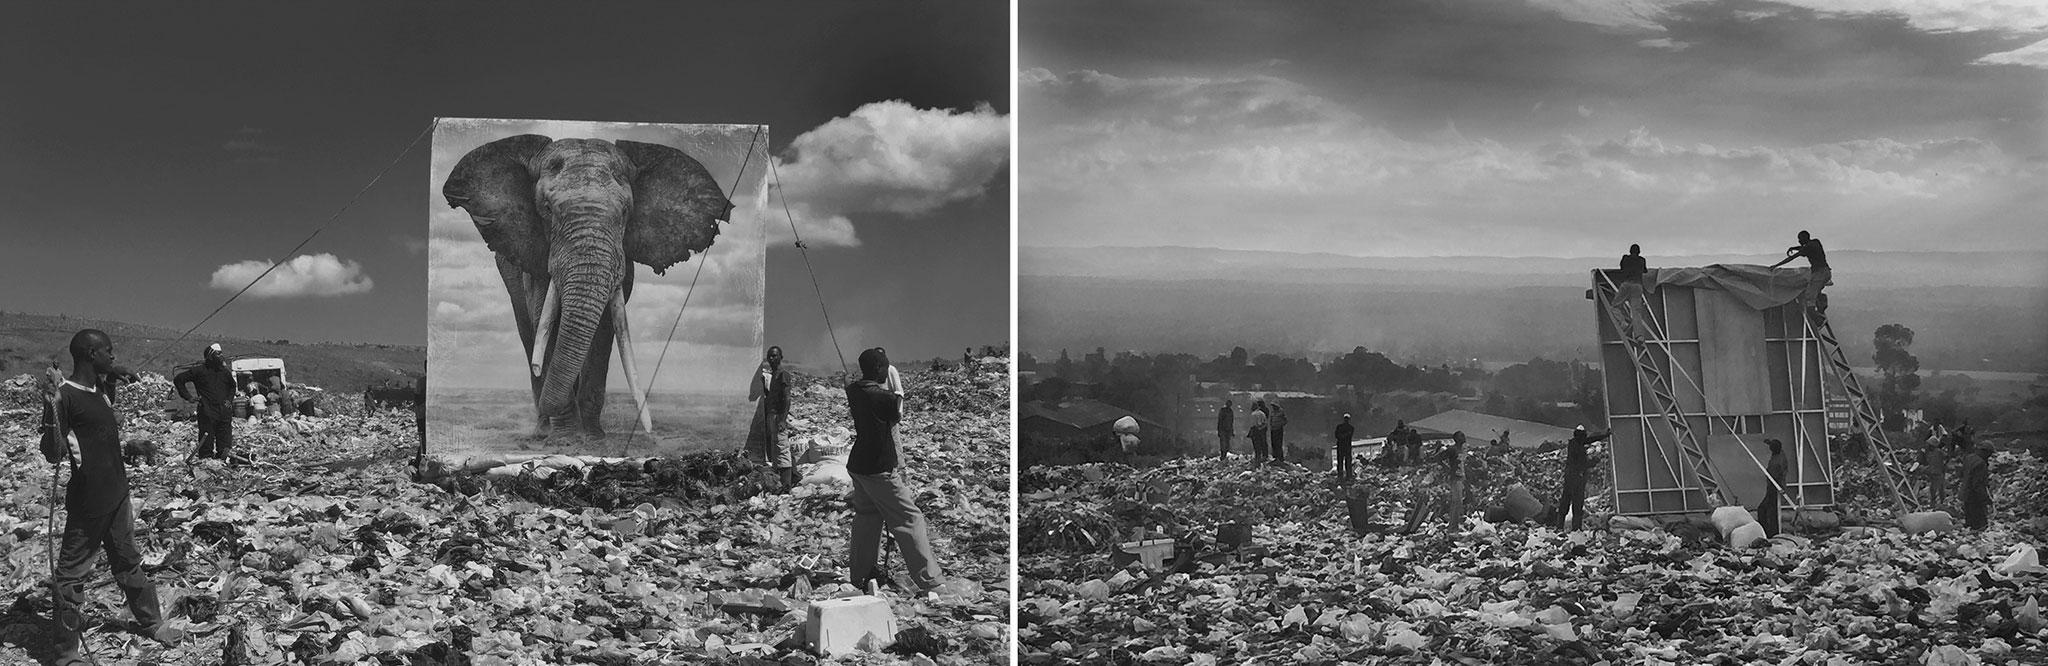 x-inherit-the-dust-behind-the-scenes-elephant-panel-on-dumpsite-x2.jpg